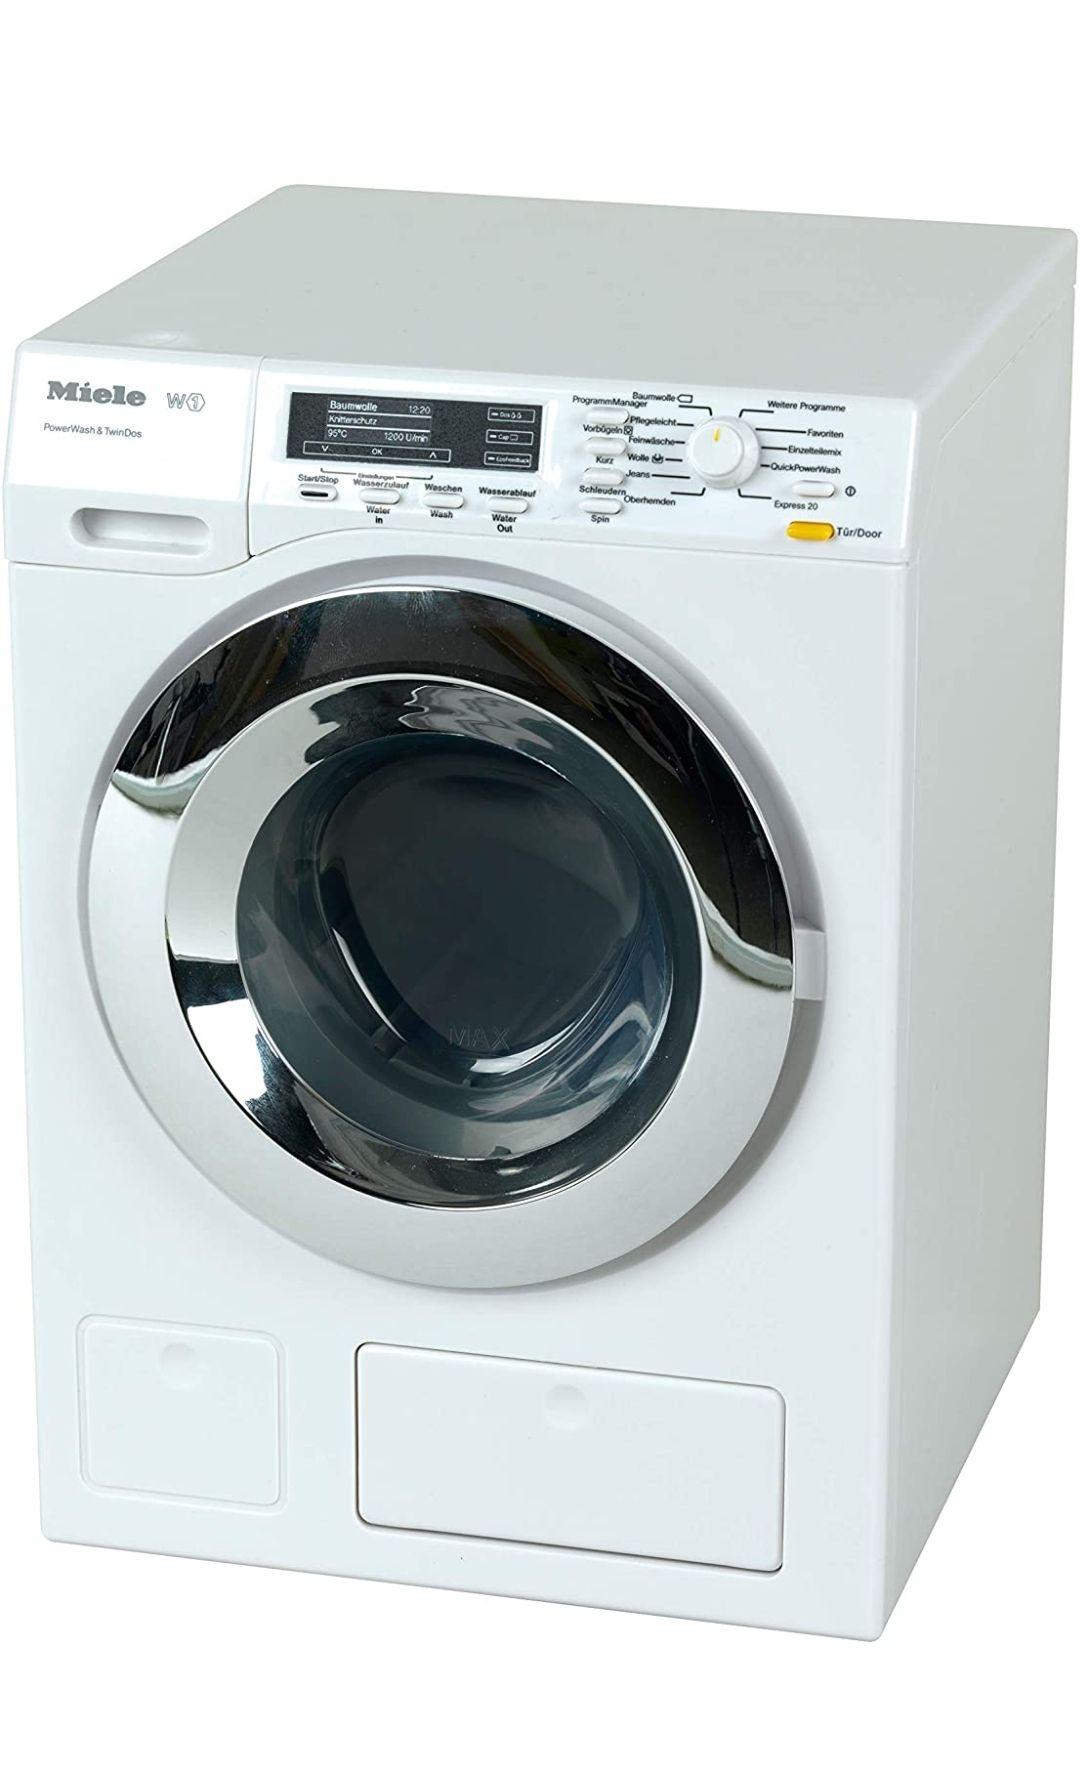 Reaco lavadora Miele de juguete